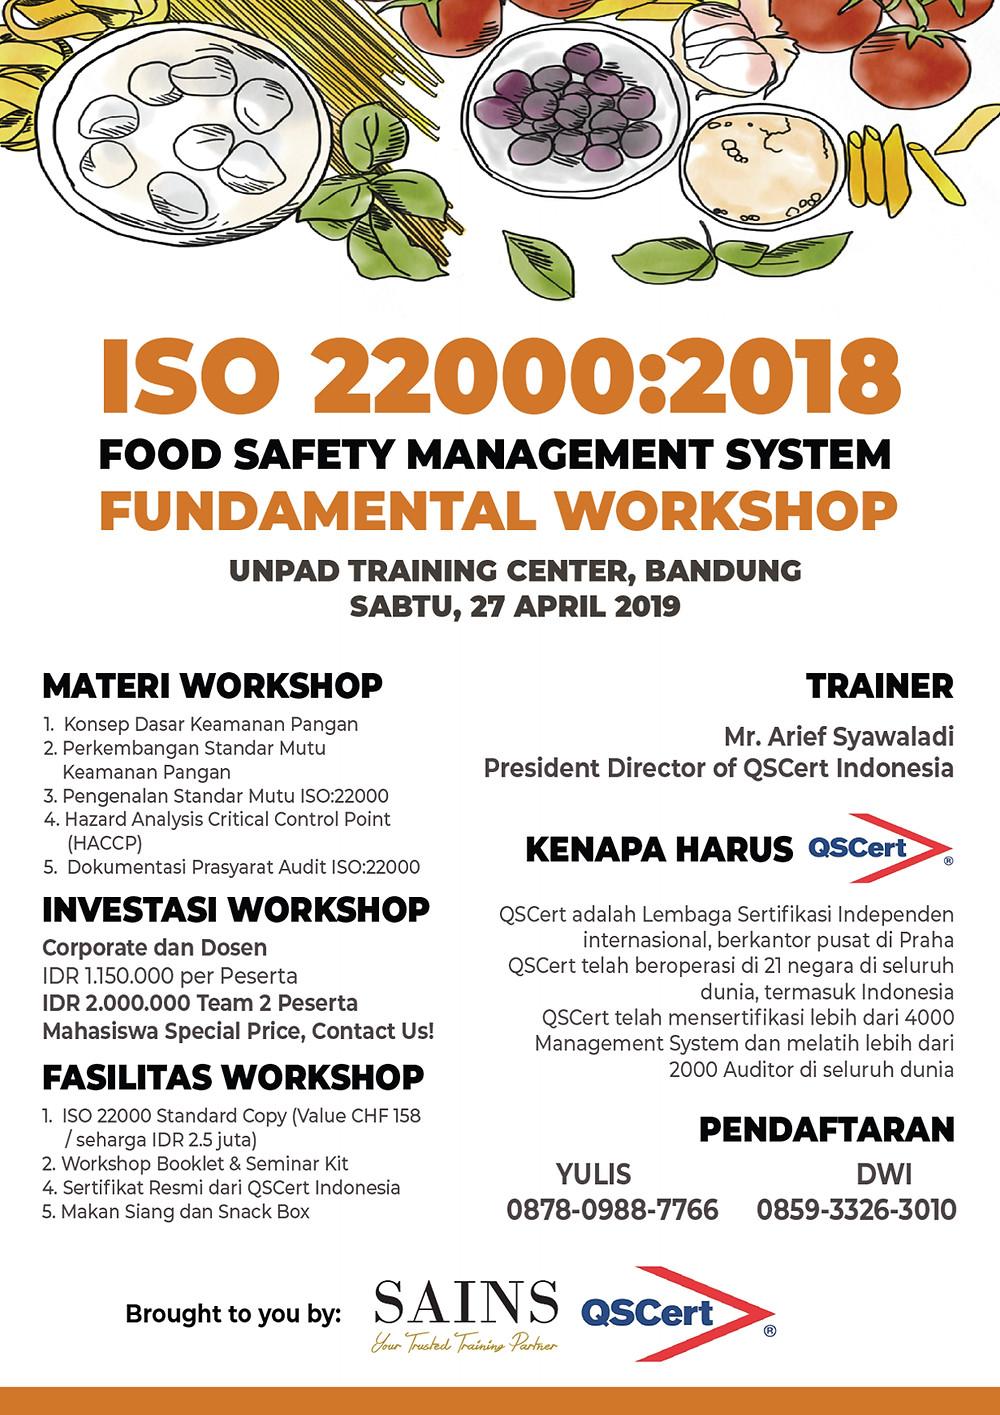 27 April 2019, Universitas Padjajaran Bandung, IDR 1.150.000, Info : 0878 0988 7766 (Yuli)